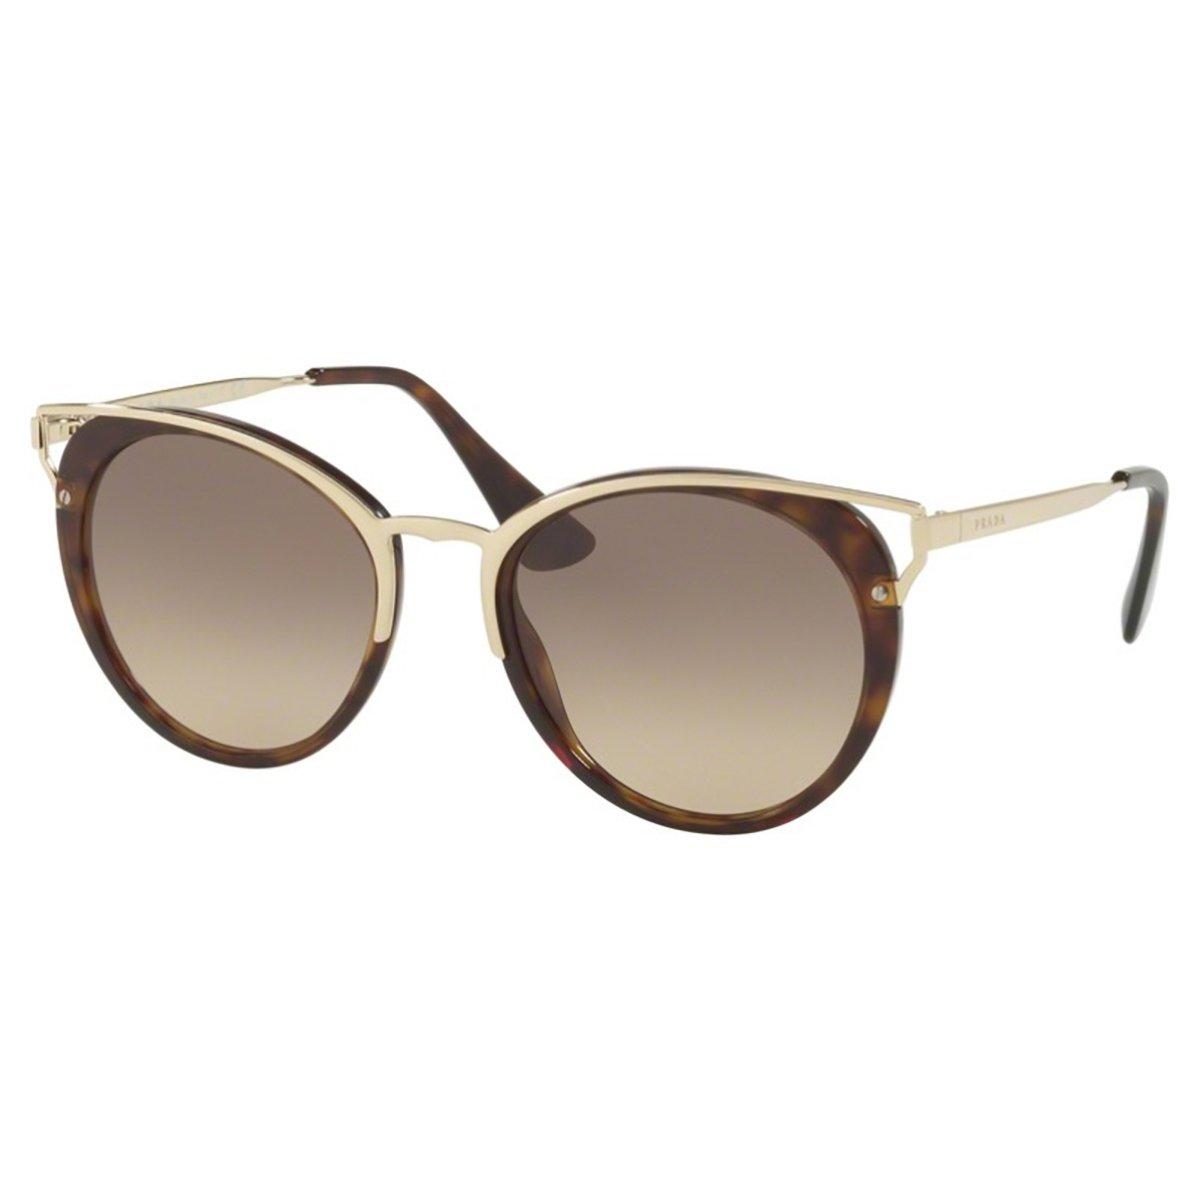 759d2678814b2 Óculos de Sol - Prada - Feminino